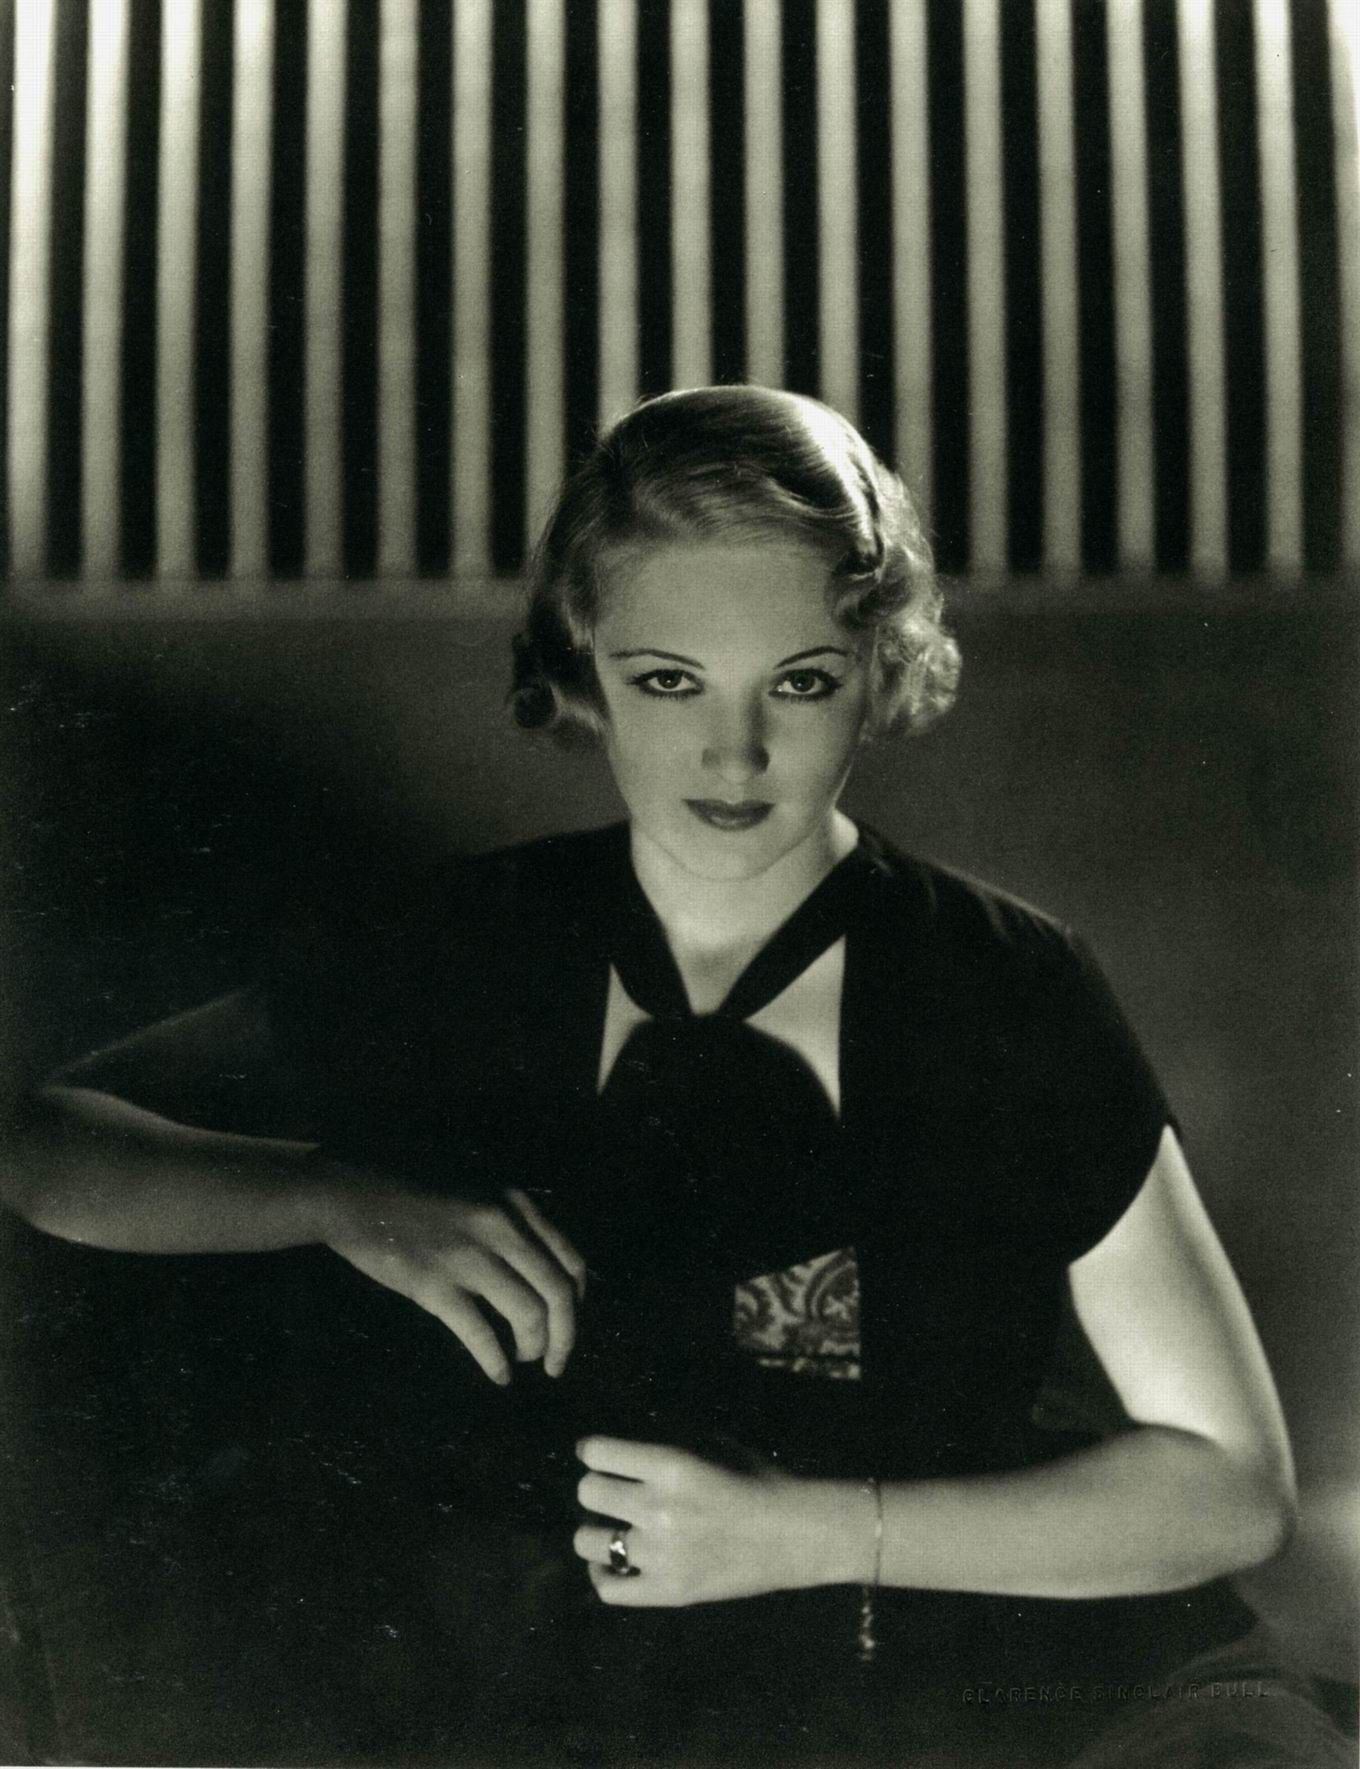 Lolit Solis (b. 1947)